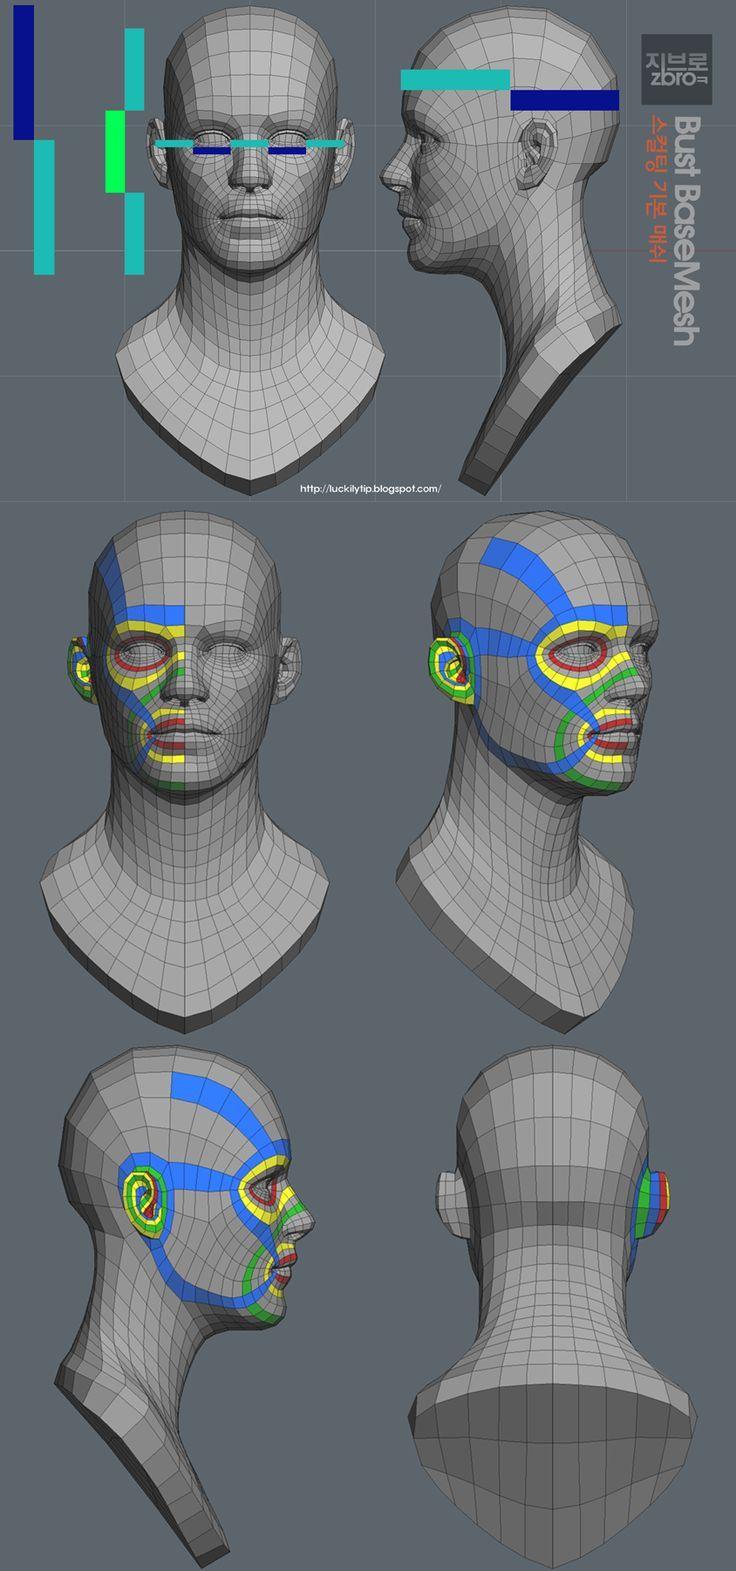 Hey i'm sharing this mesh. zbro bust base mesh_2 (ztl /obj) #BaseMesh #zbrush #wireframe